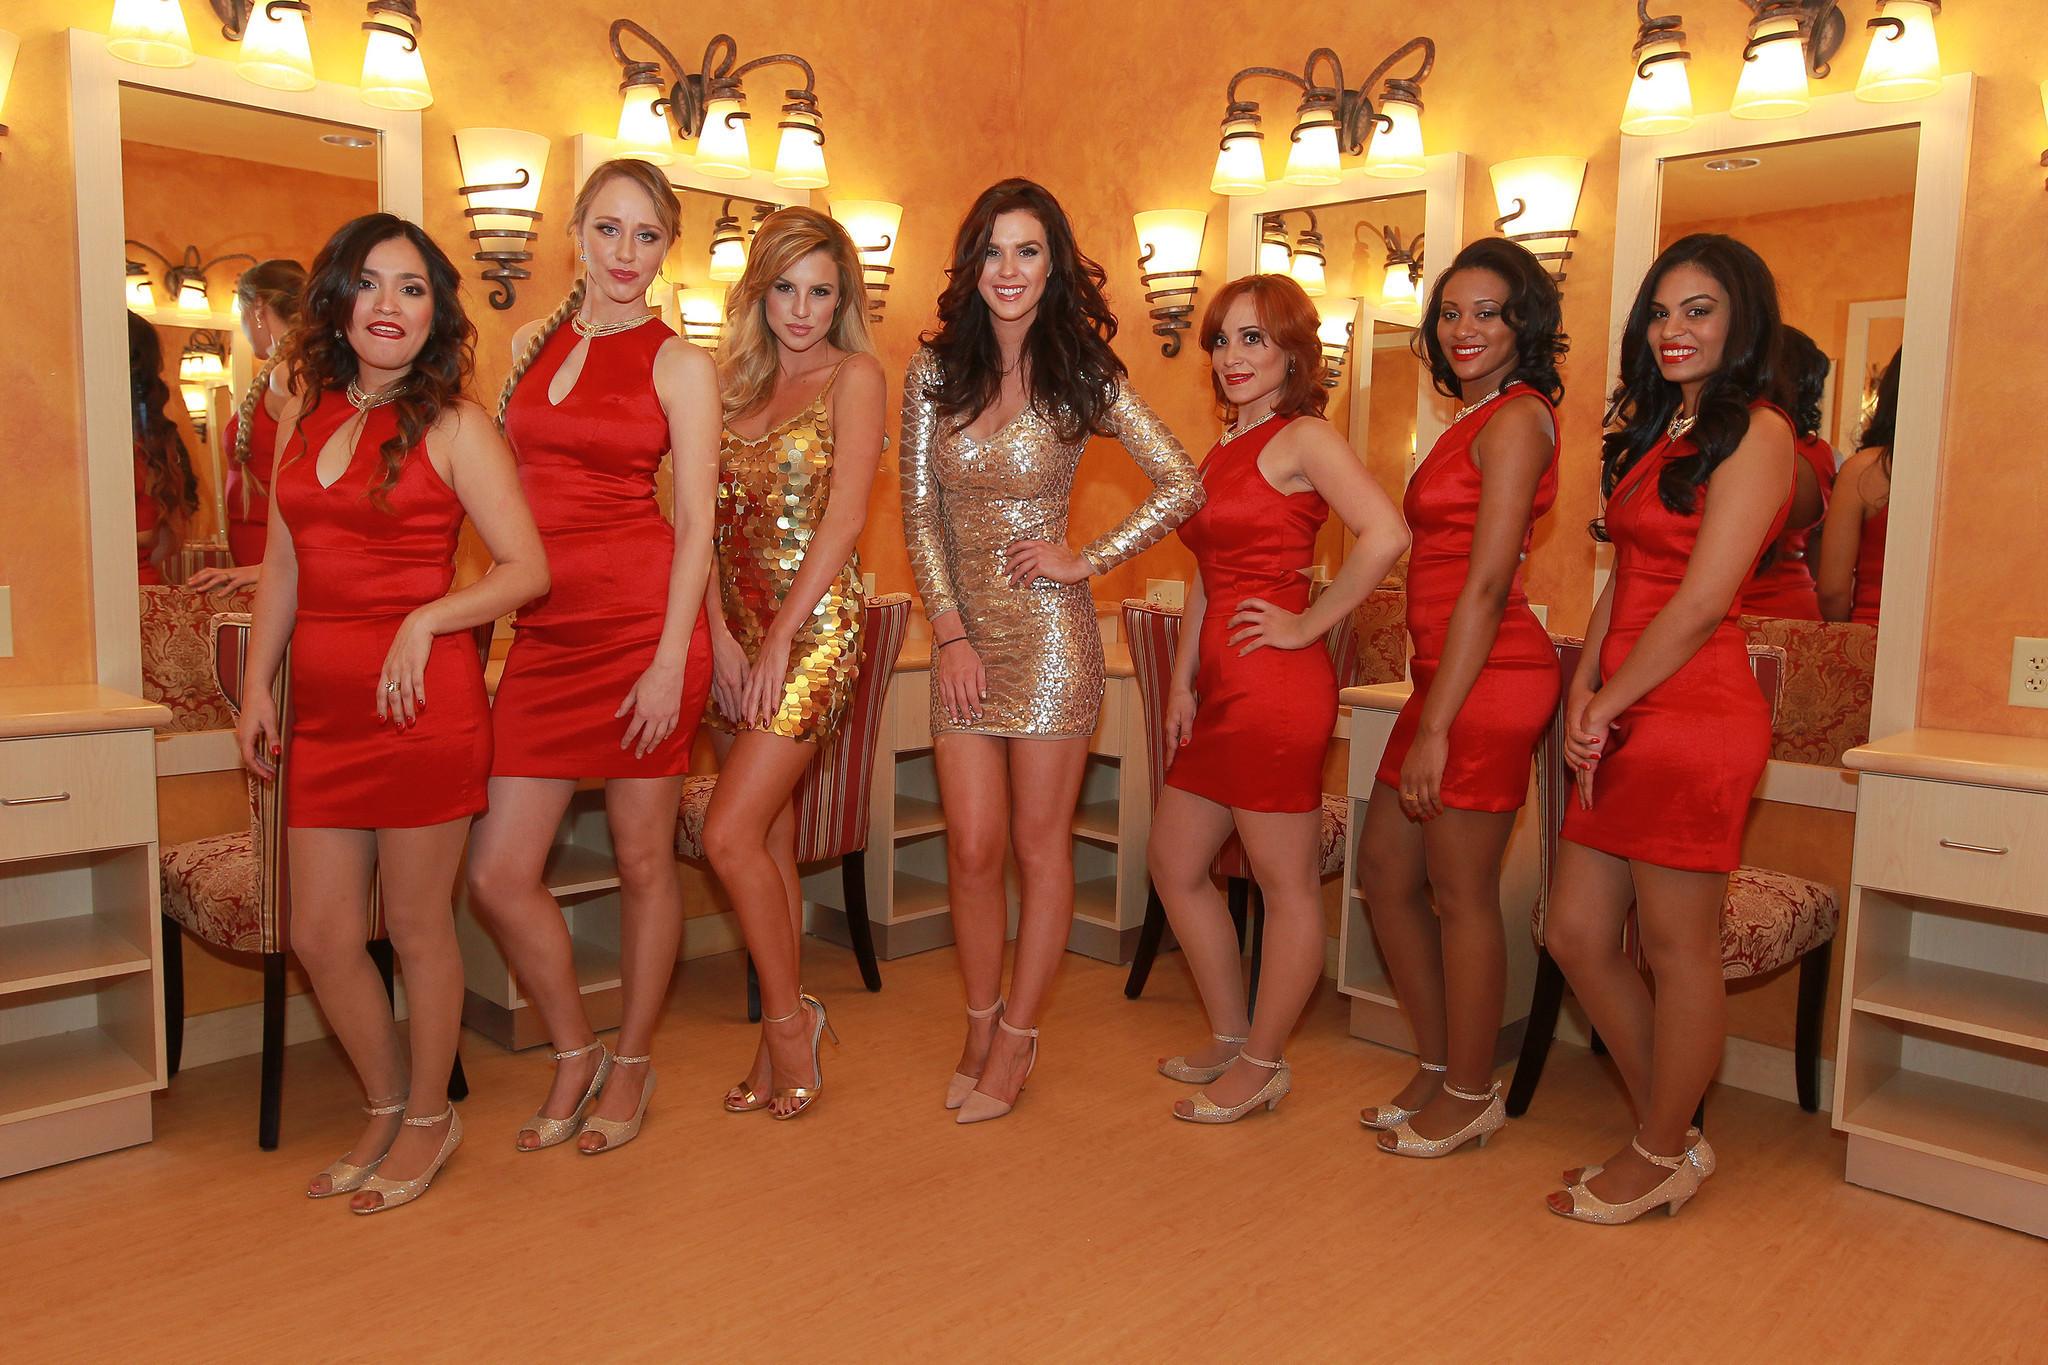 Girls Show 28254